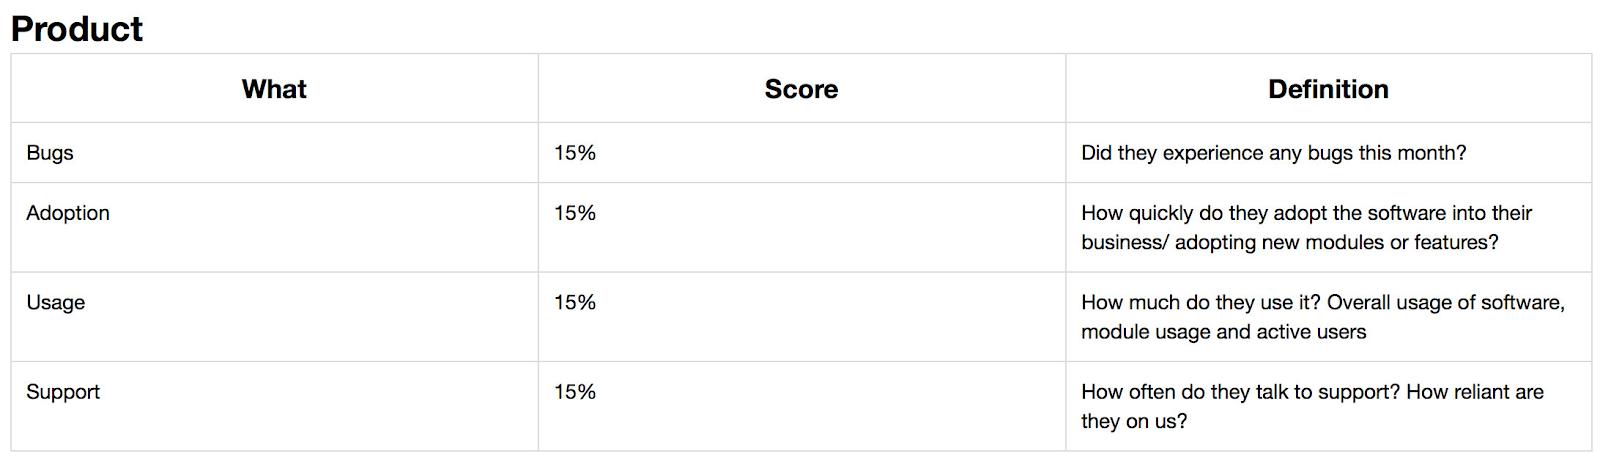 customer-health-score-percentage